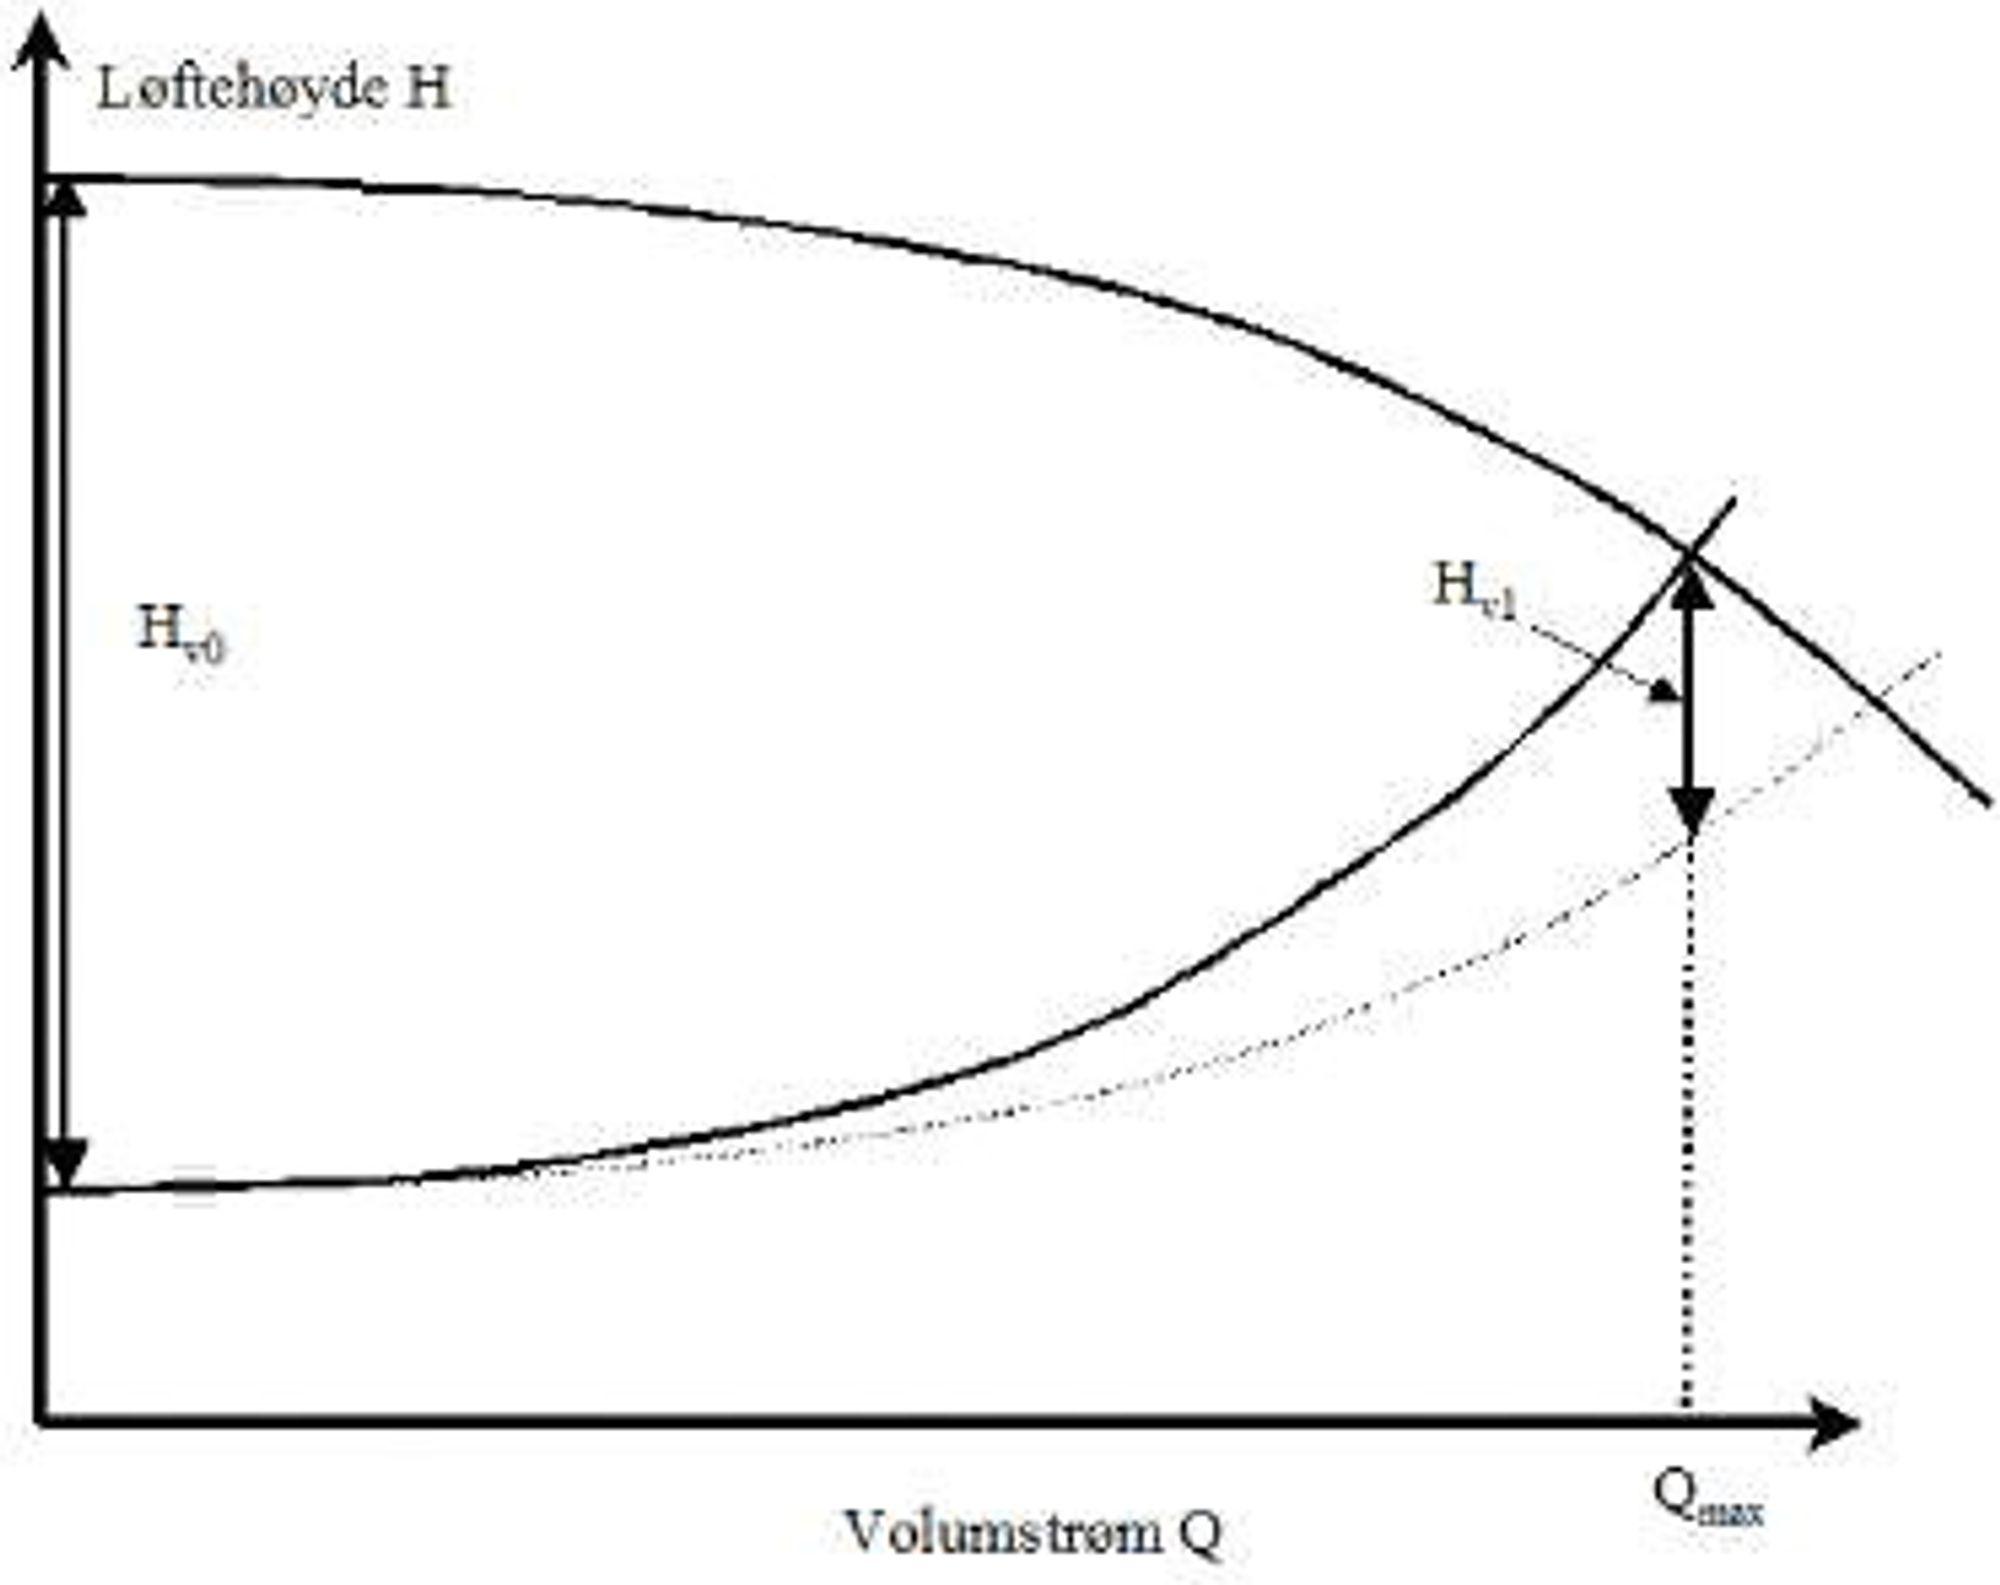 Sammenligning av trykkfallet ved maks. volumstrøm, Hv1, med trykkfallet ved stengt ventil, Hv0.